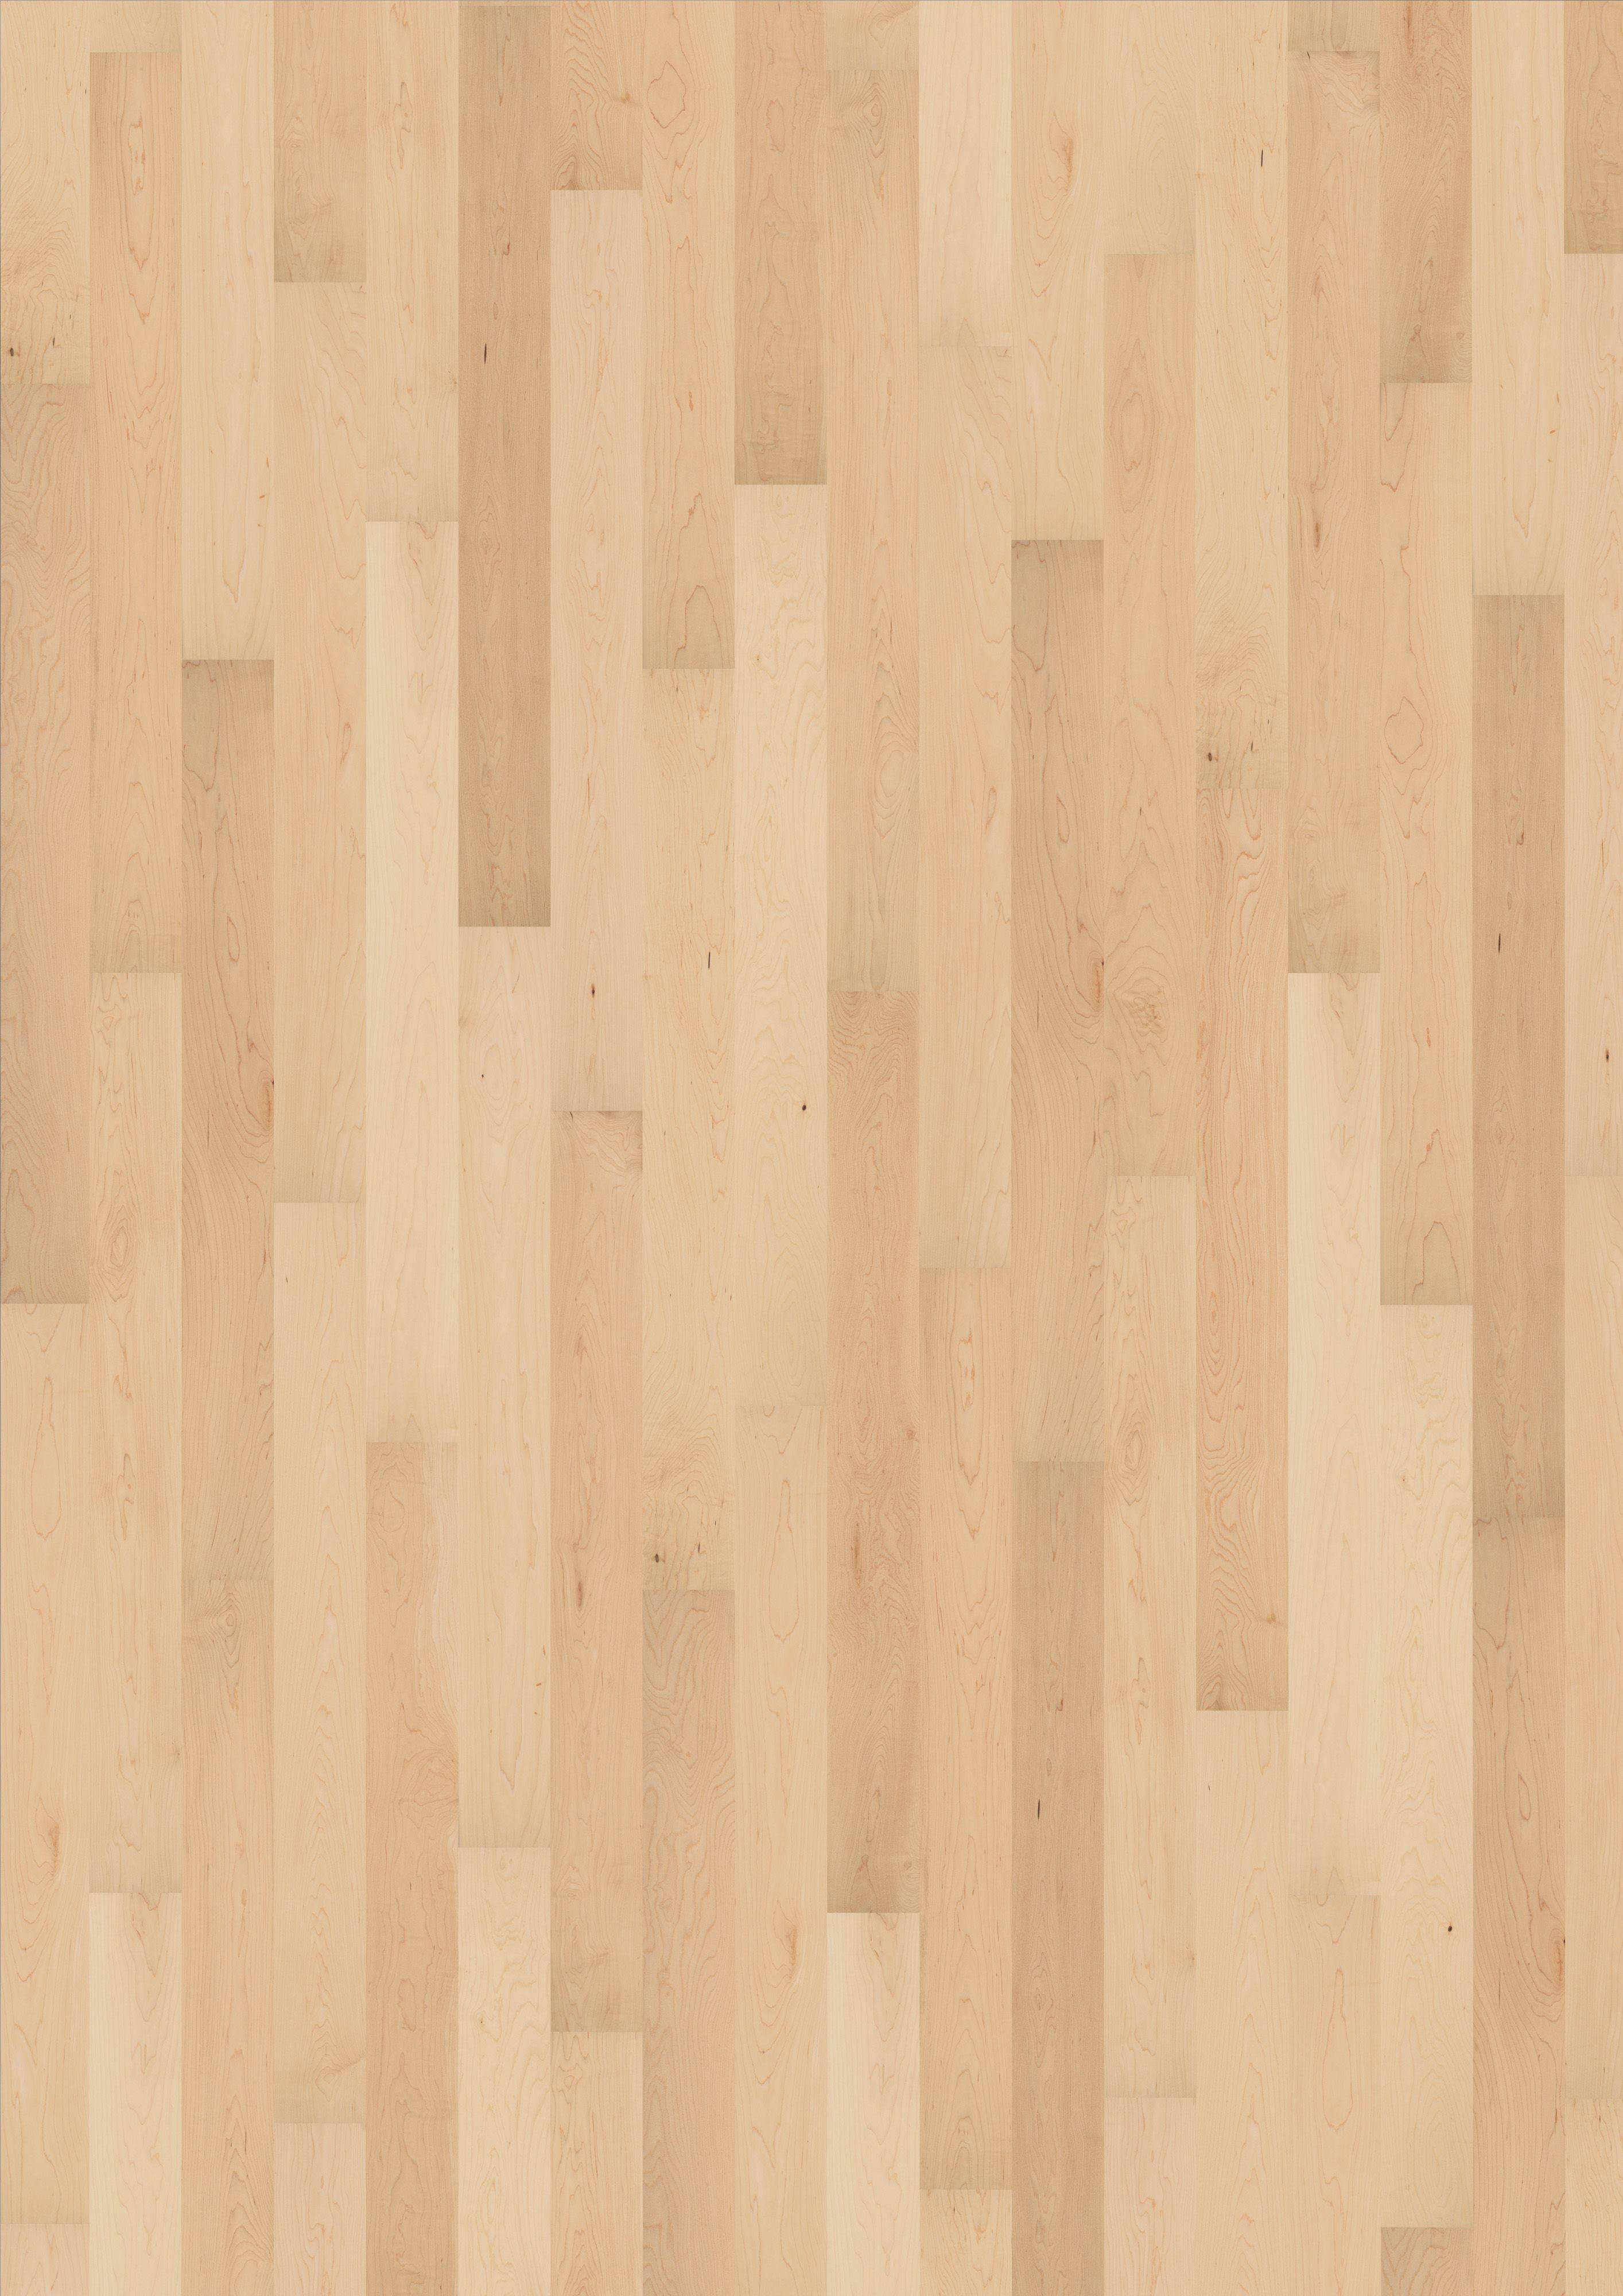 Khrs  Wood flooring  Parquet  Interior  Design  www